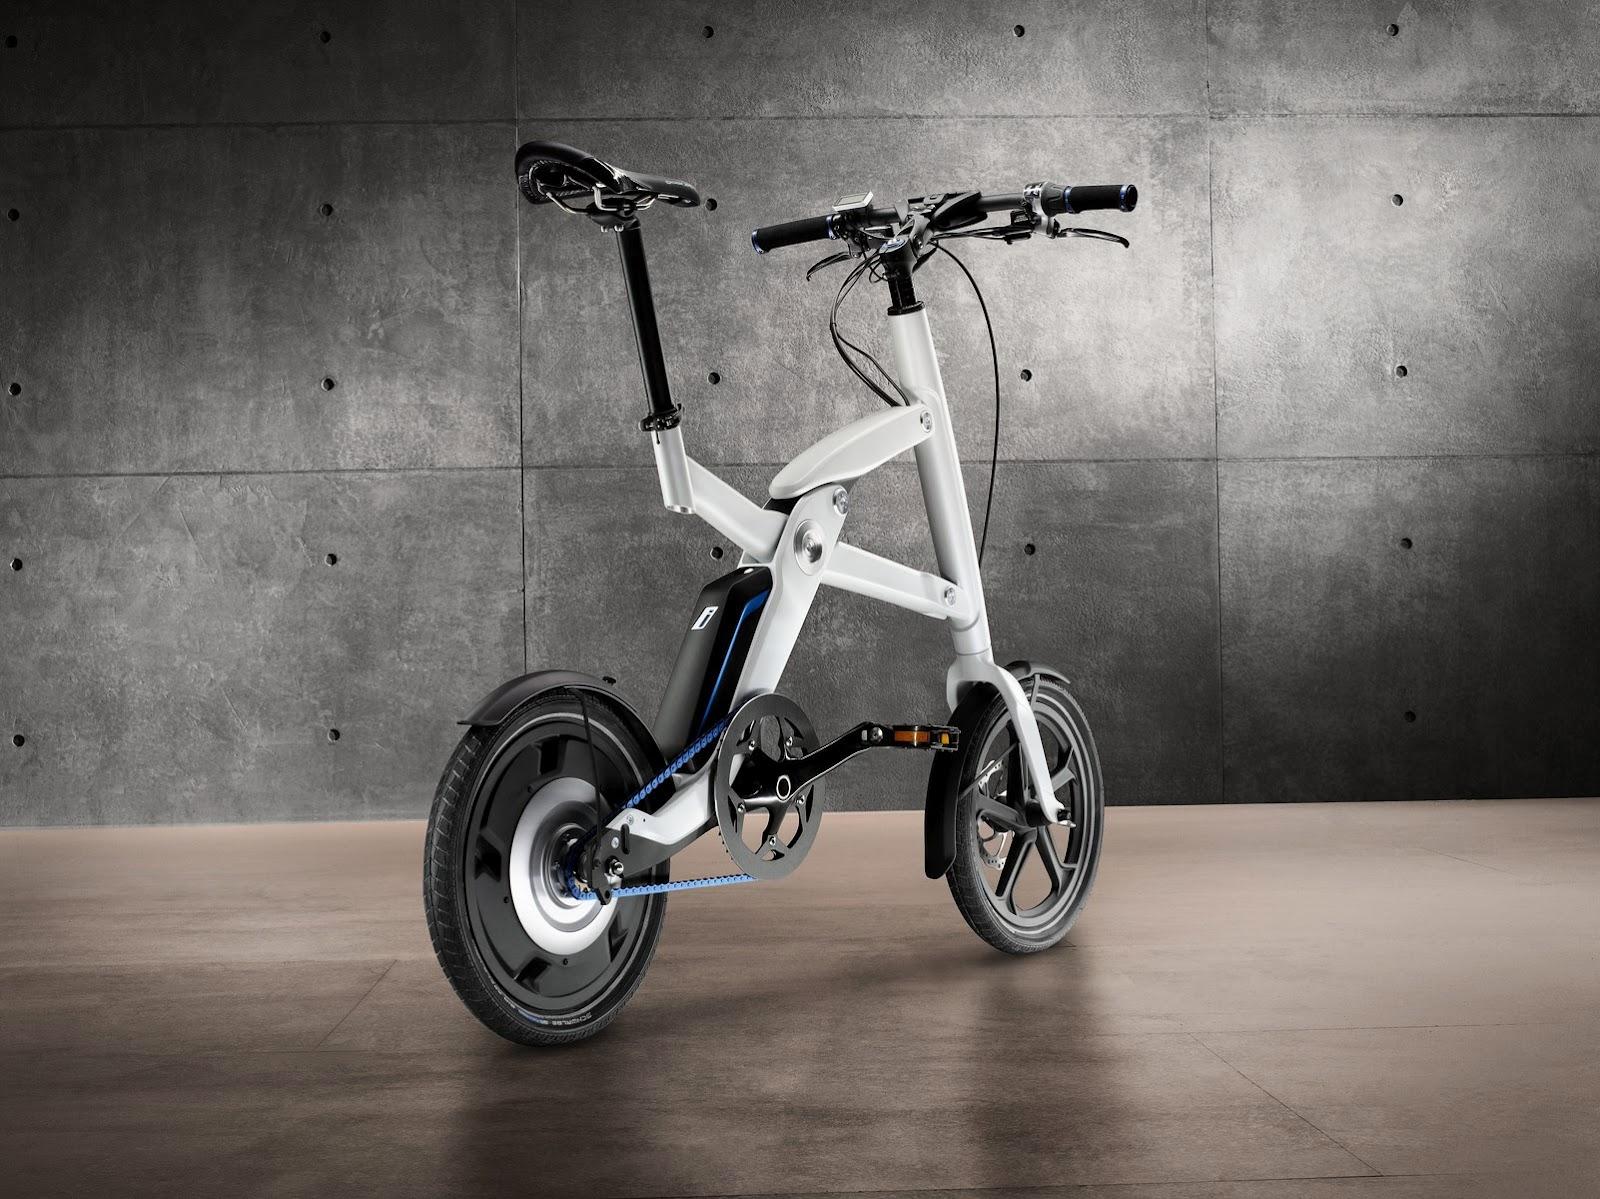 http://4.bp.blogspot.com/-nzfzJBYMhrM/UAWkTustL5I/AAAAAAAAC5U/OJvbouTO4hY/s1600/Bmw_i_Pedelect_Concept_Design_Bicycle_HD_Wallpaper-CarWallBase.Blogspot.Com.jpg